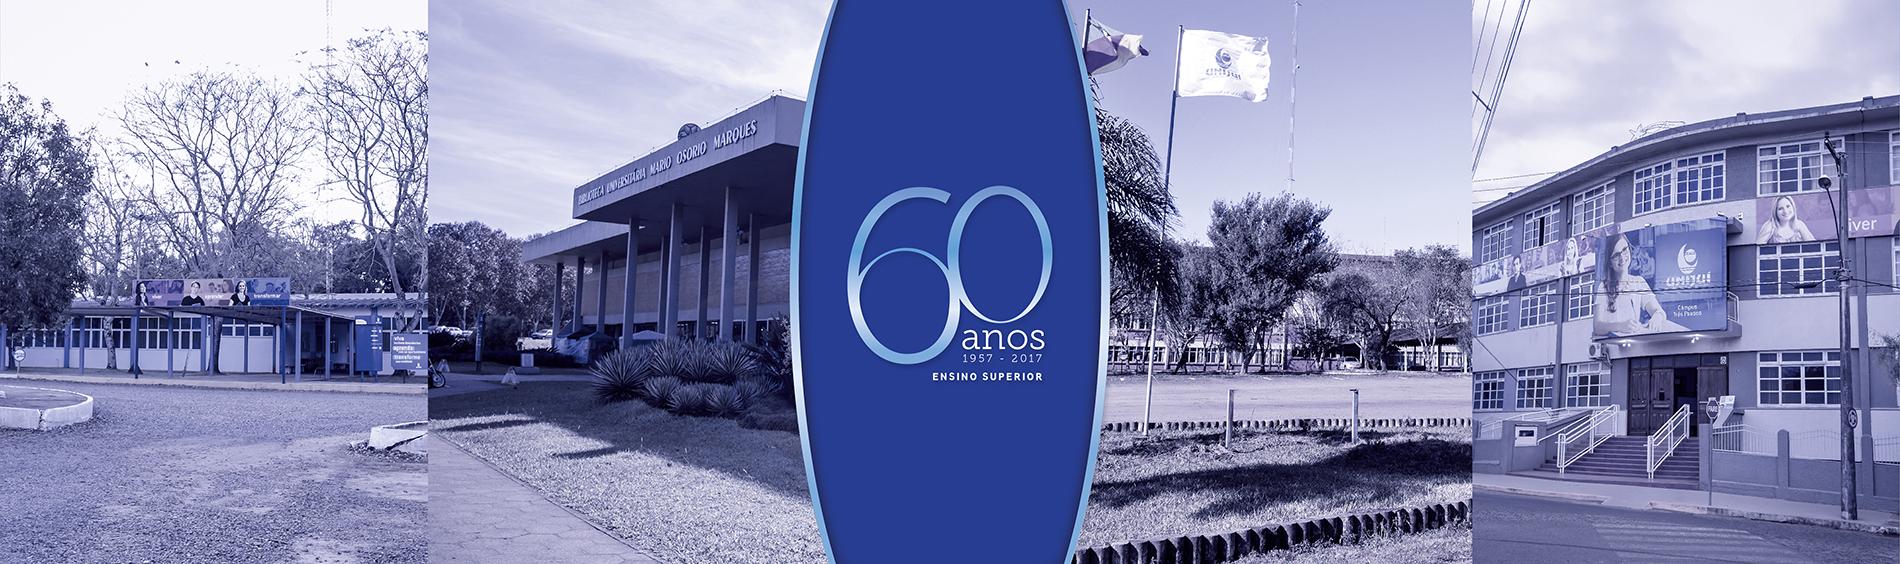 60 anos Unijuí